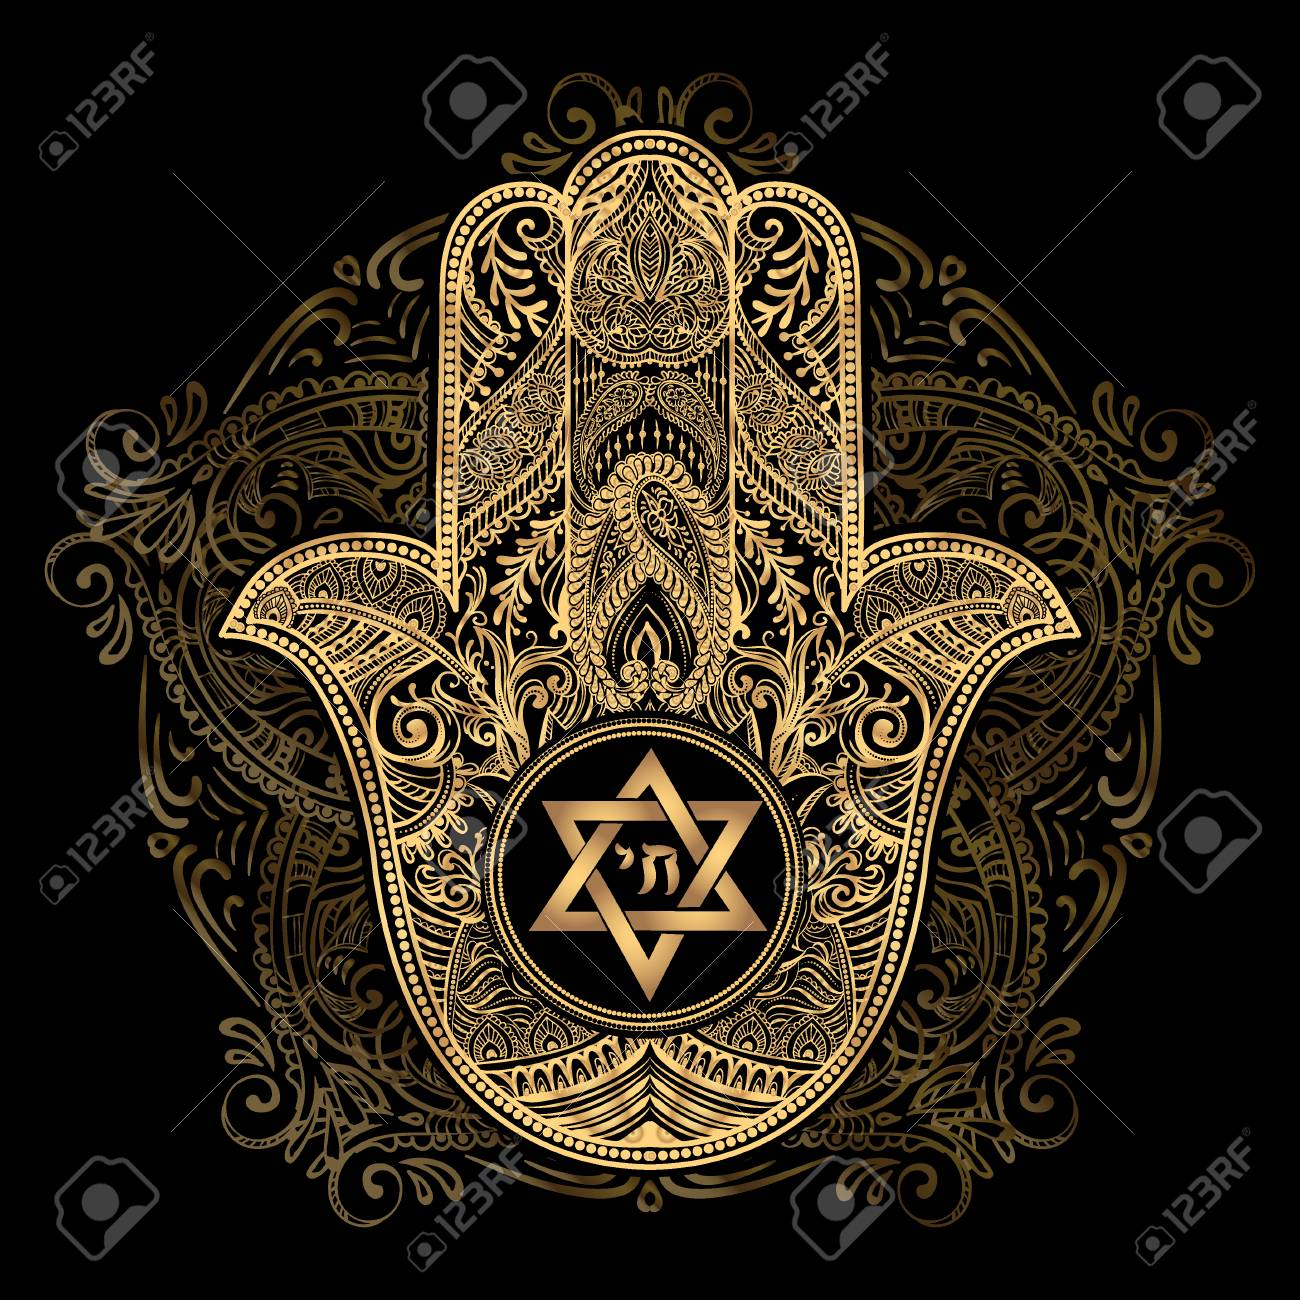 Elegant hand drawn Isolated traditional Jewish sacred amulet and religious symbols - Hamsa or hand of Miriam, palm of David, star of David, Rosh Hashanah, Hanukkah, Shana Tova - 69699579